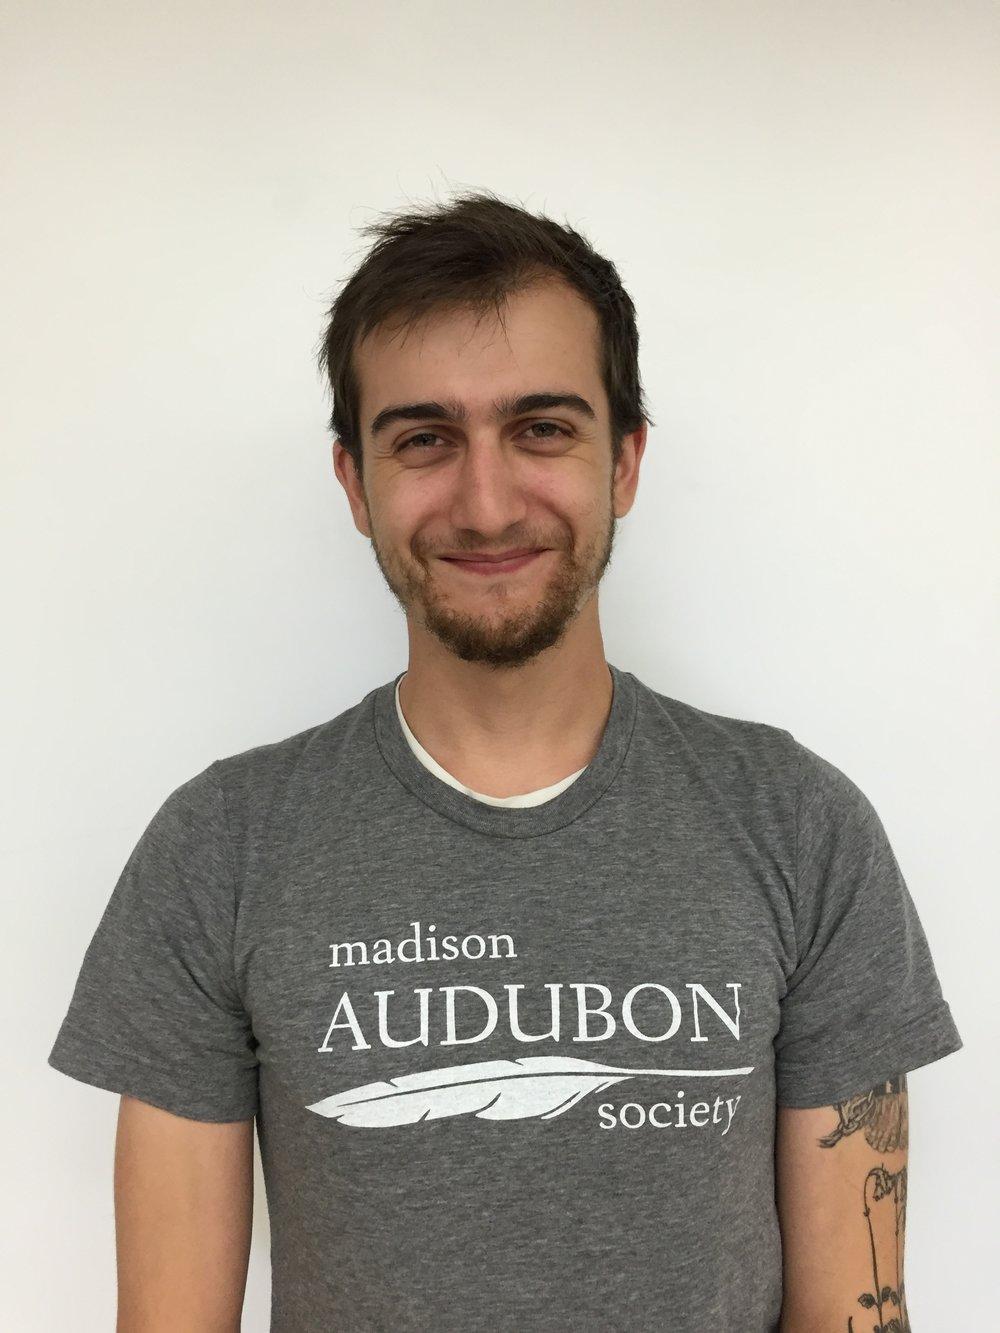 intern profiles u2014 madison audubon